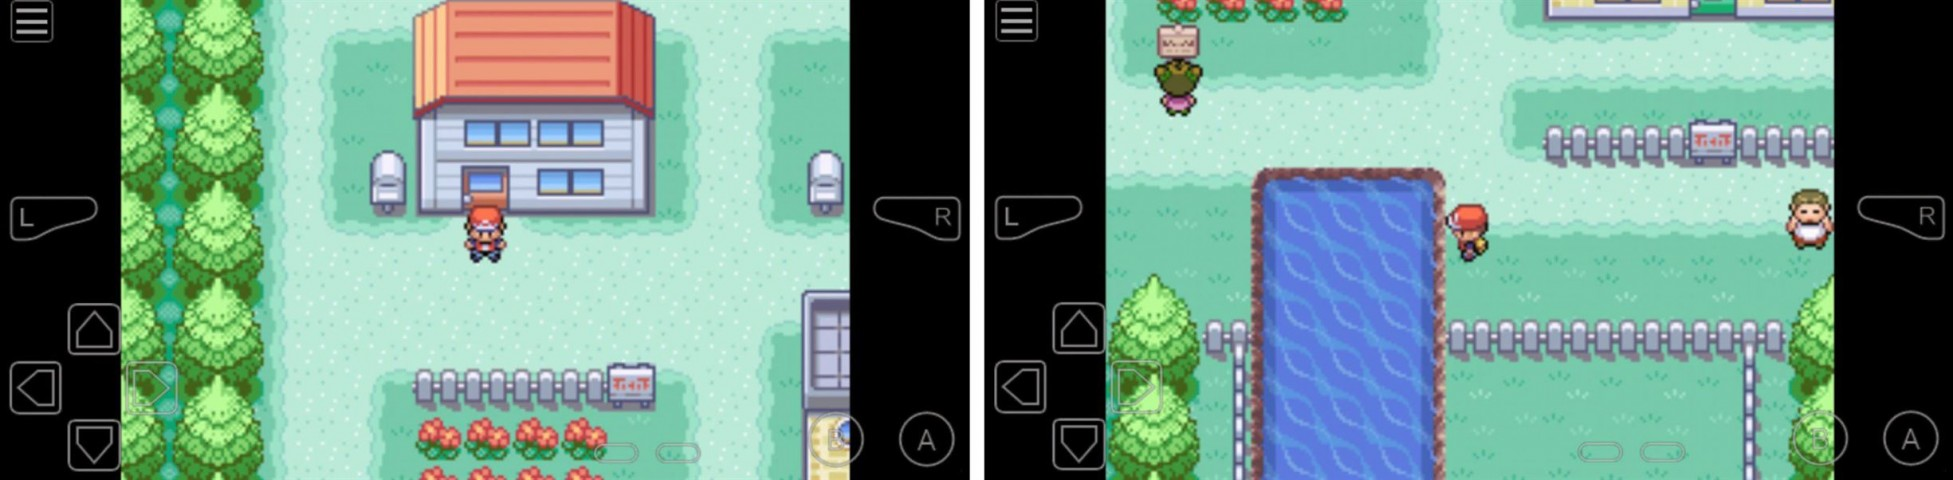 pokemon-fire-red-apk-download.jpg